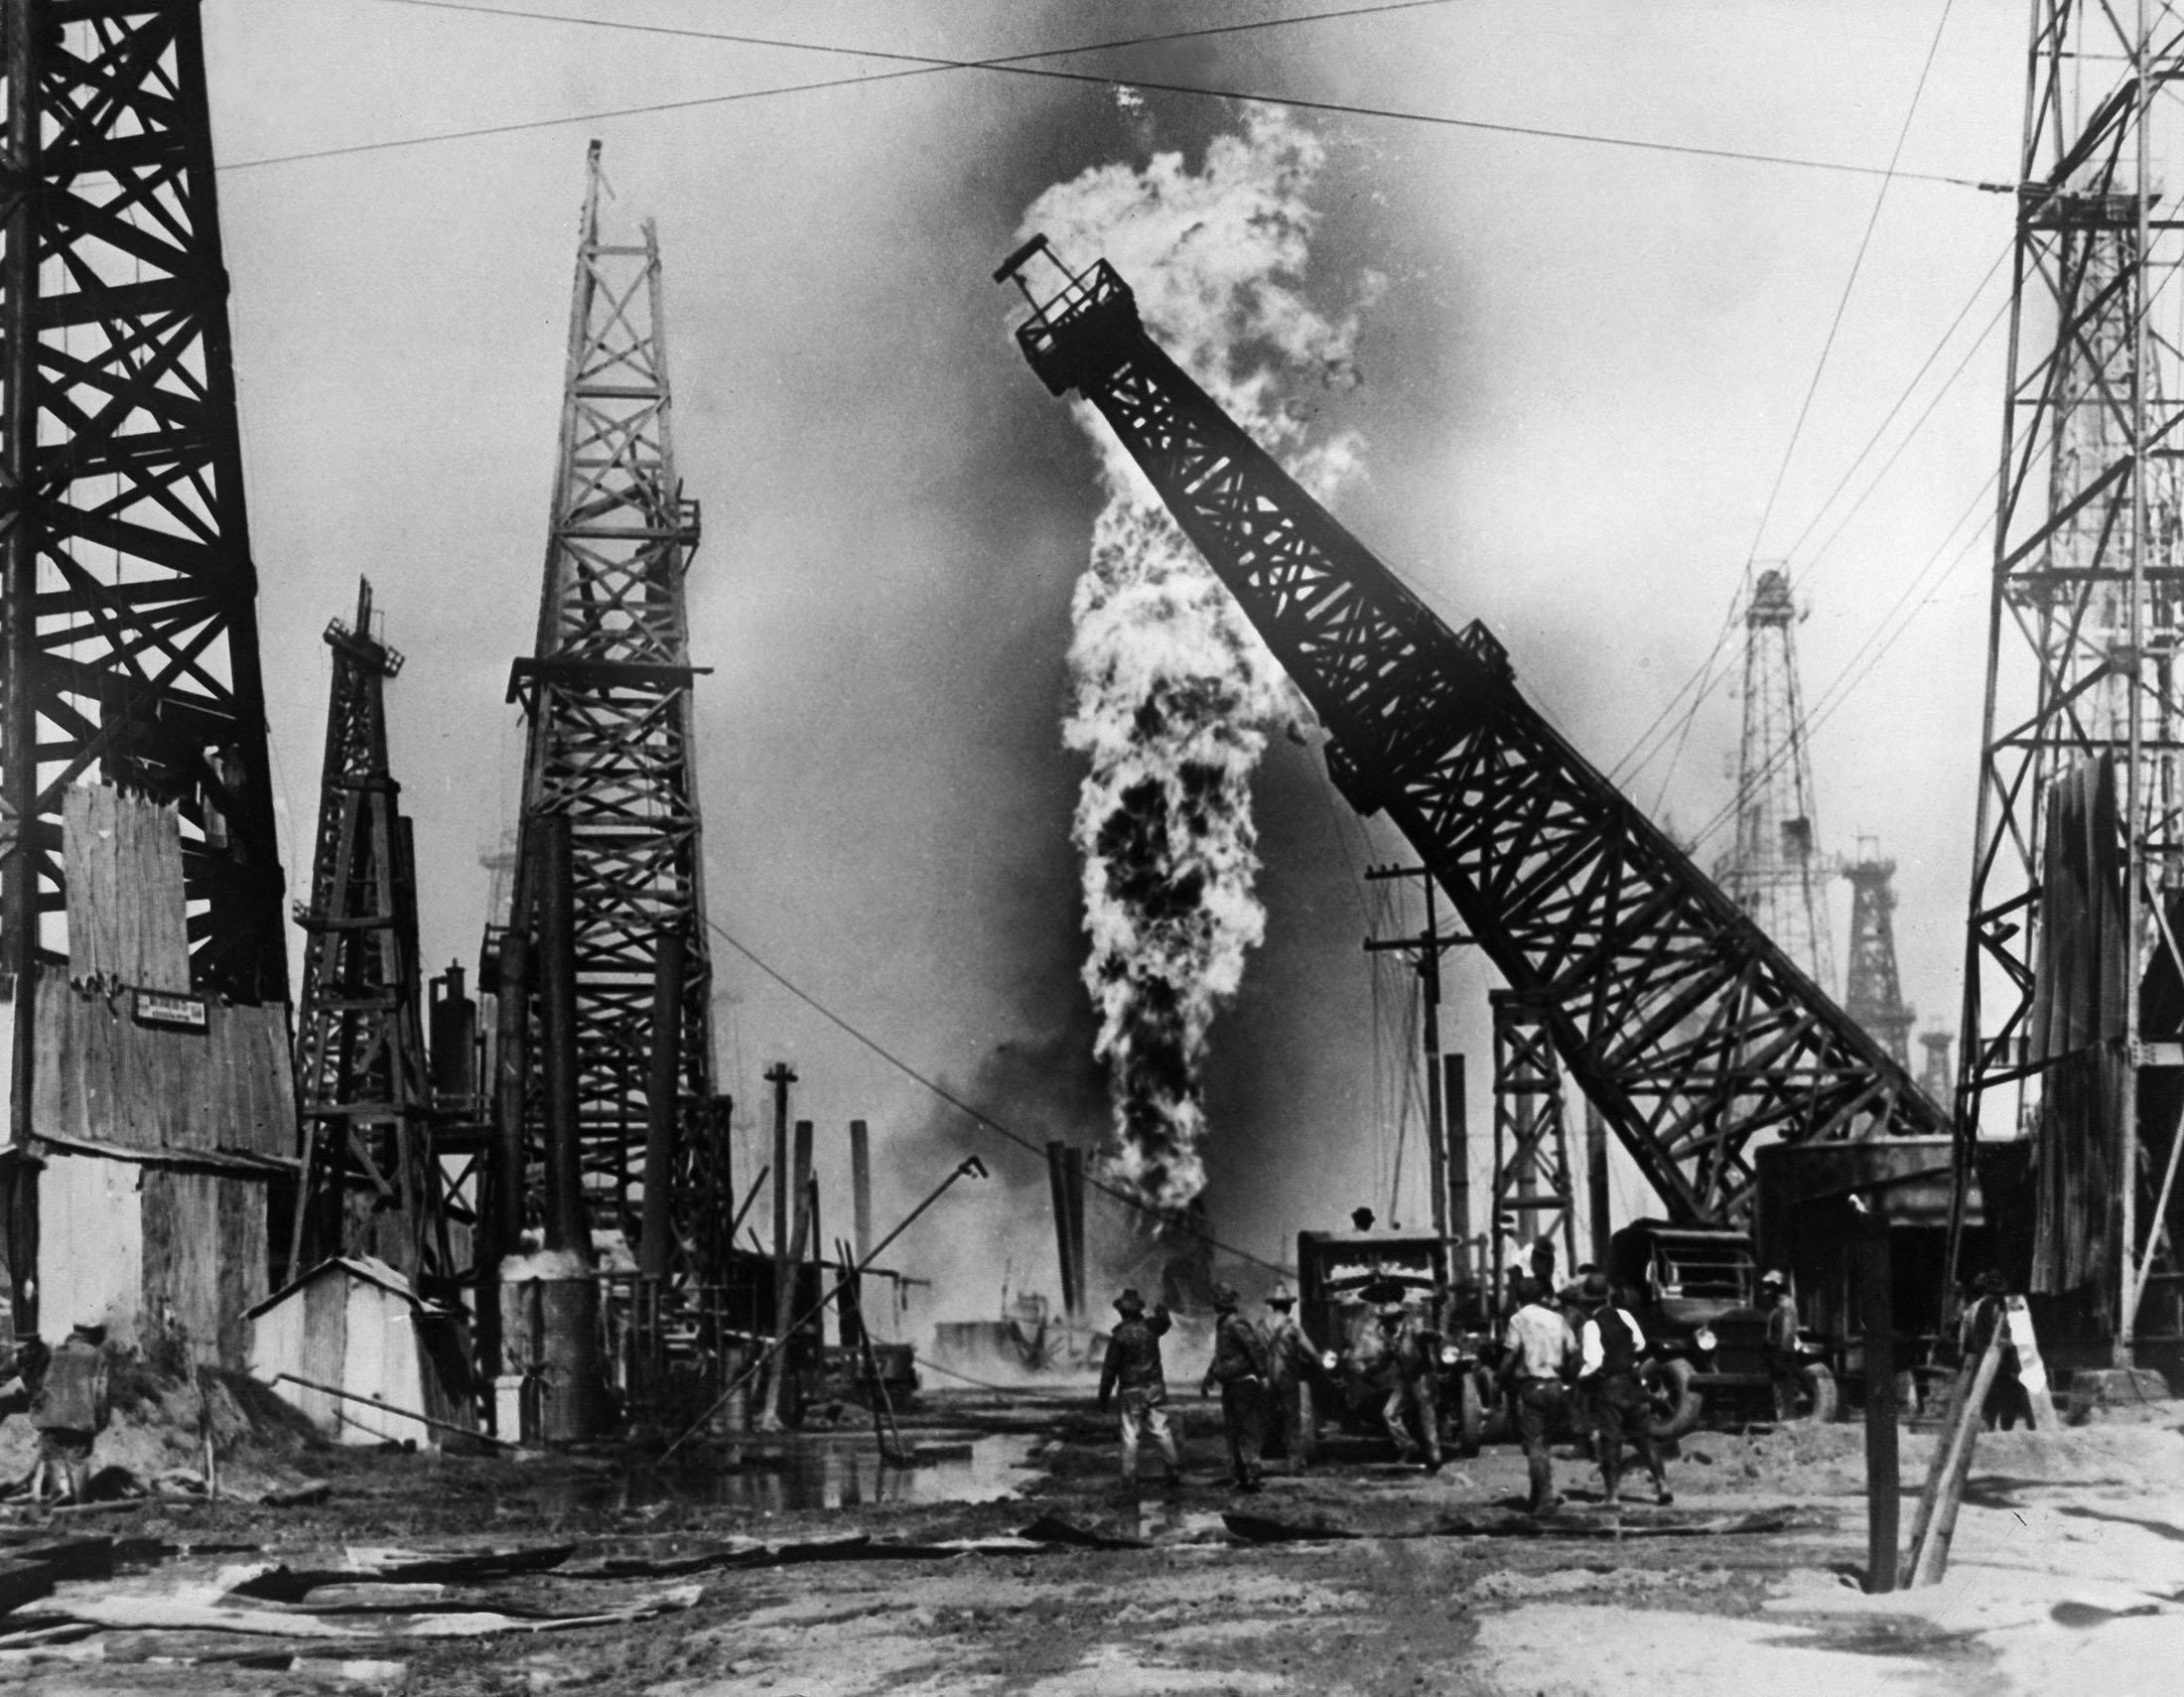 An oil field burns in California, U.S., 1928. (Getty Images)